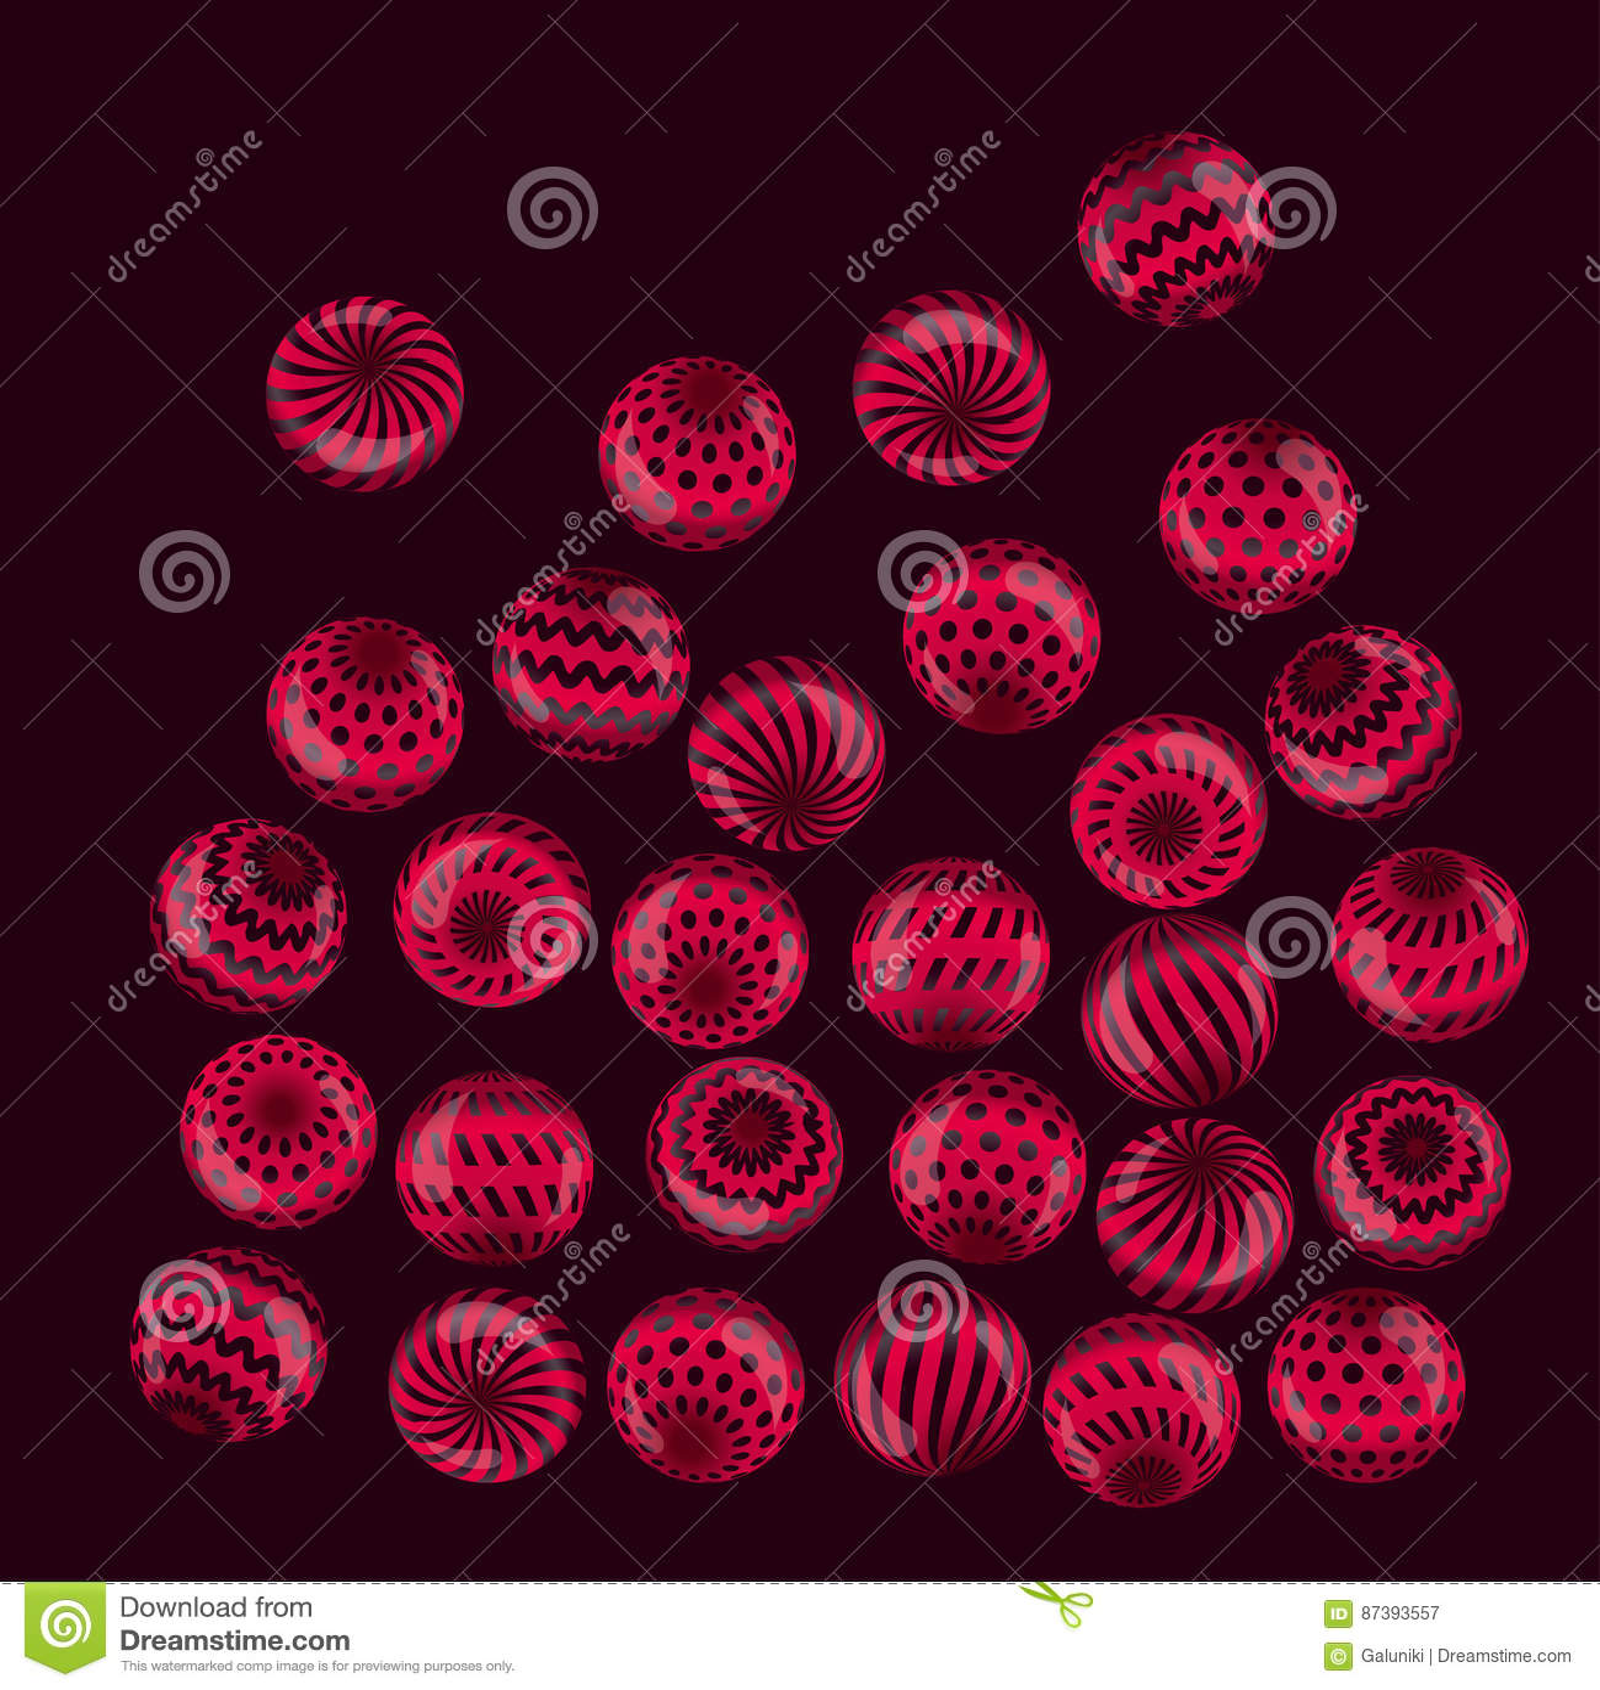 Crimson Circle Studio Creative Spaces: Circle Red Beads Necklaces On Black Background. Cartoon